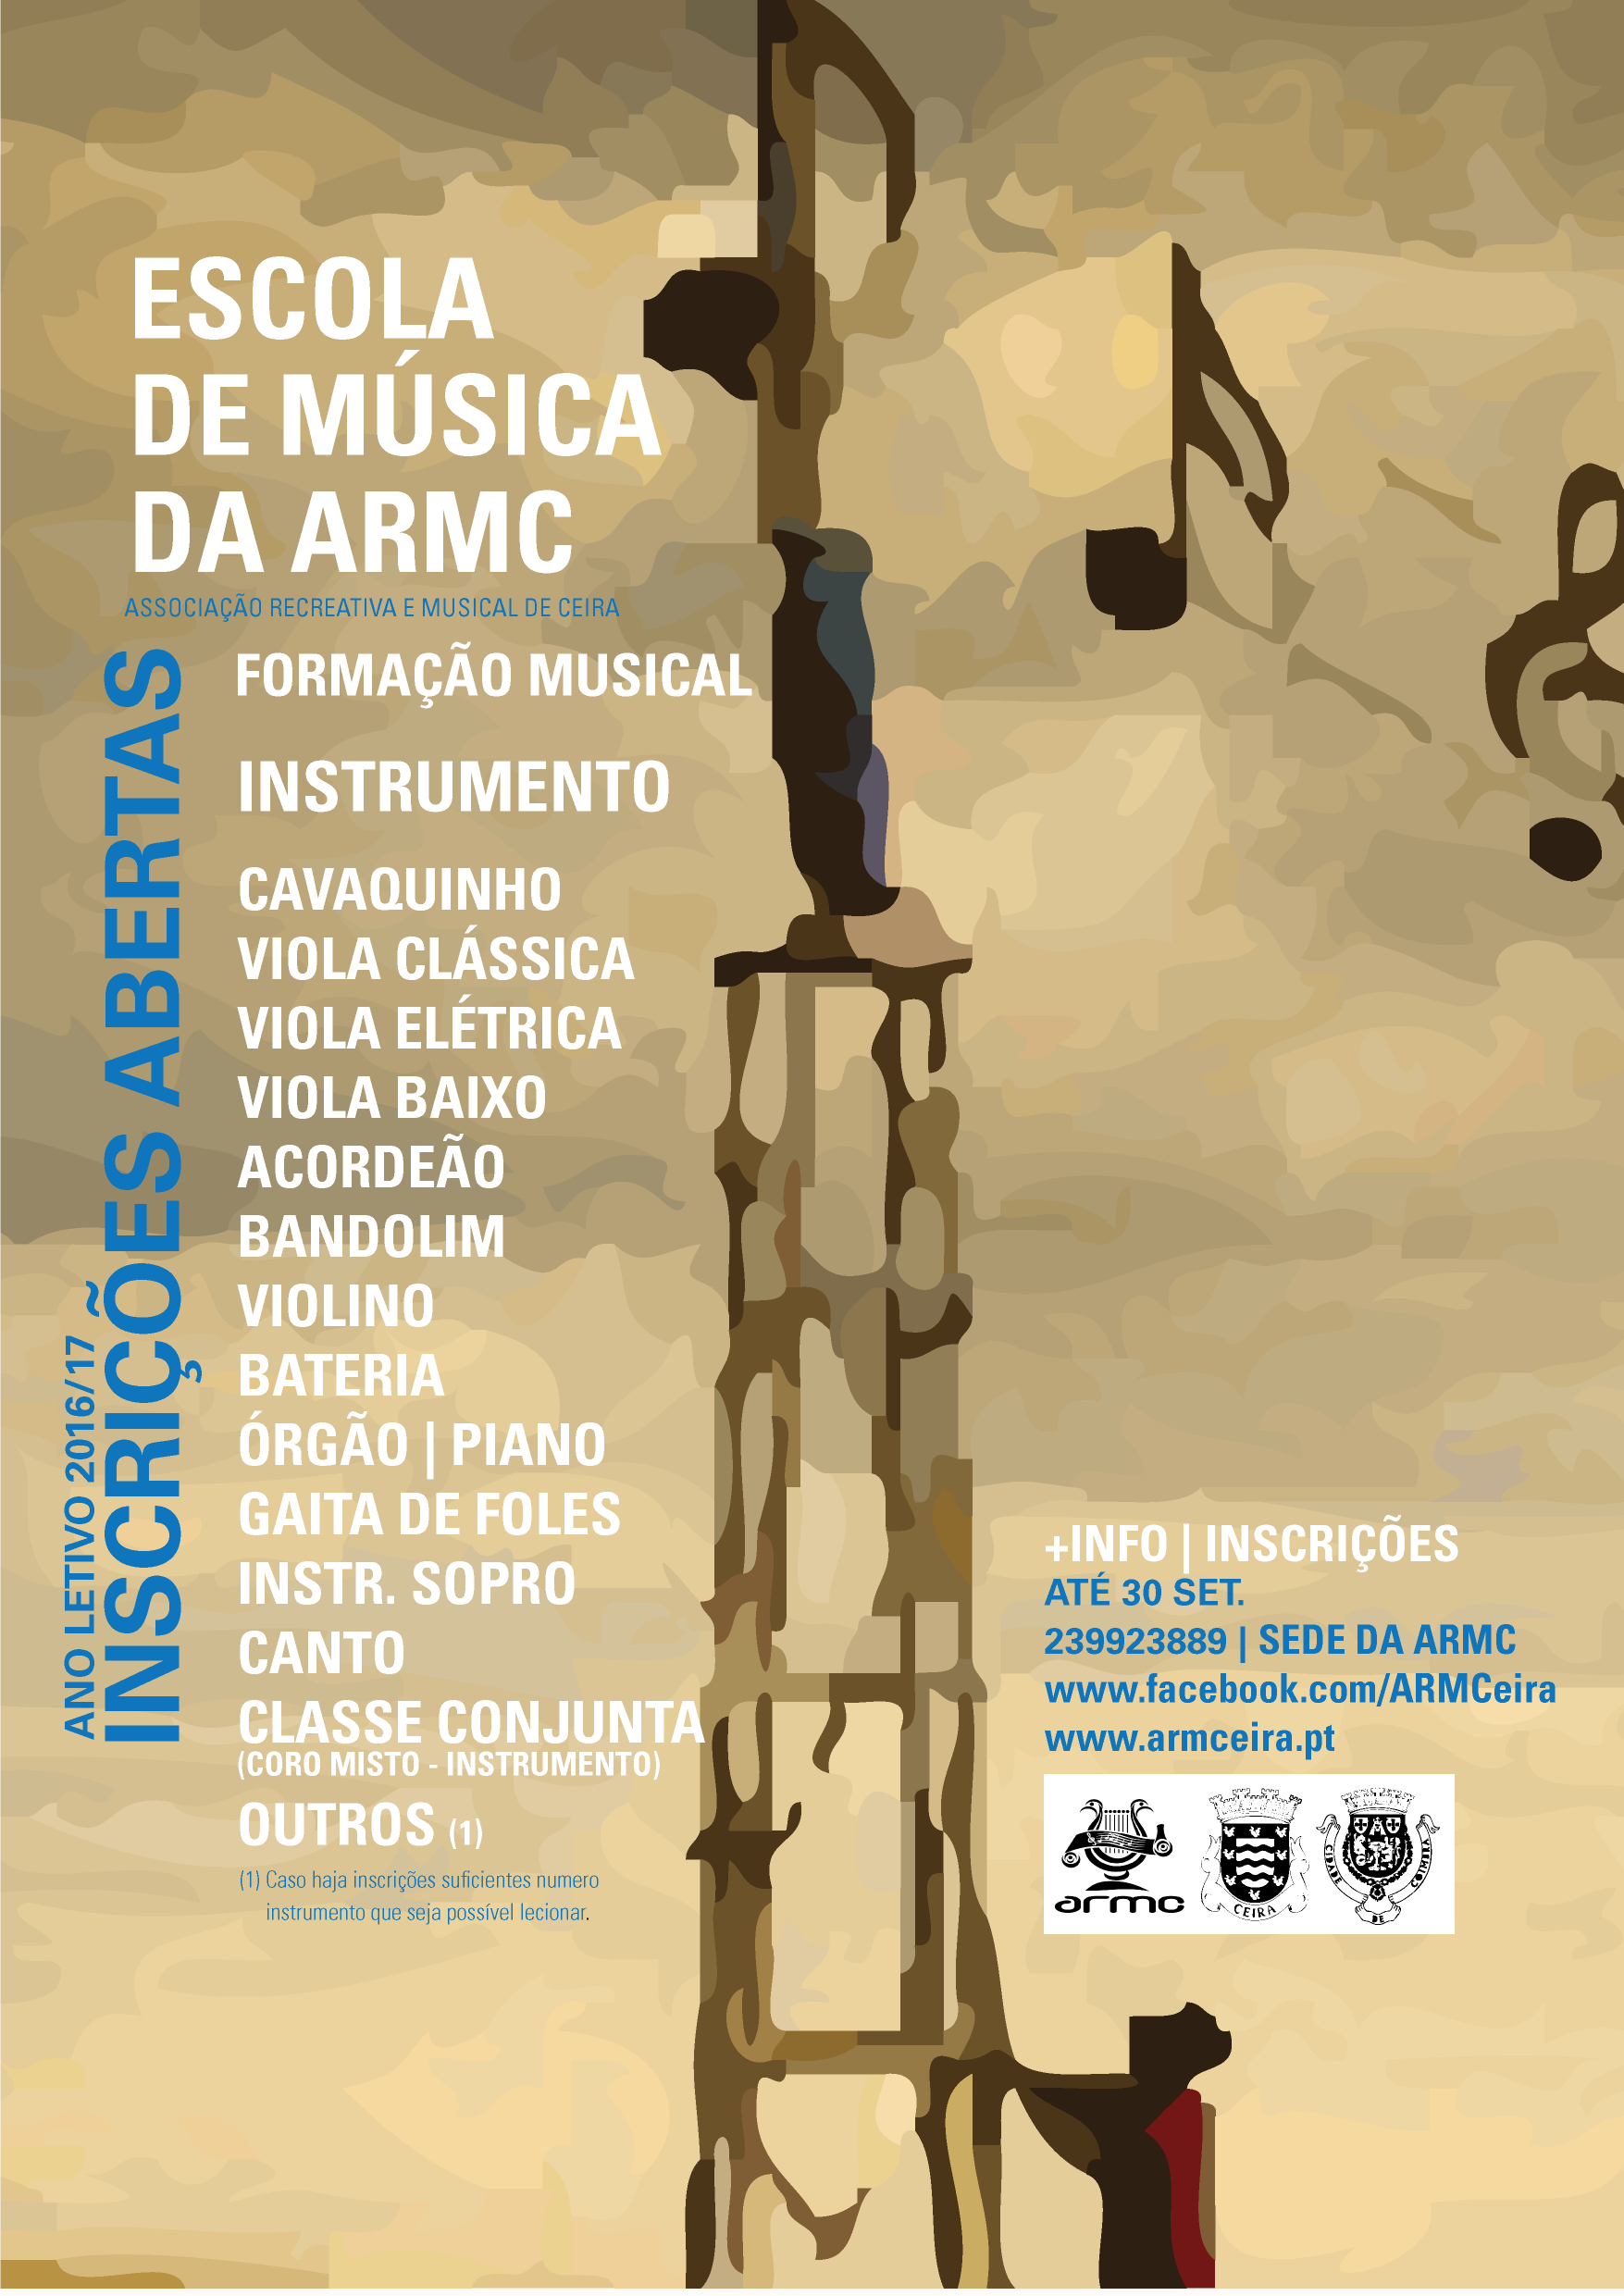 cartaz-escolamusica_armc.png